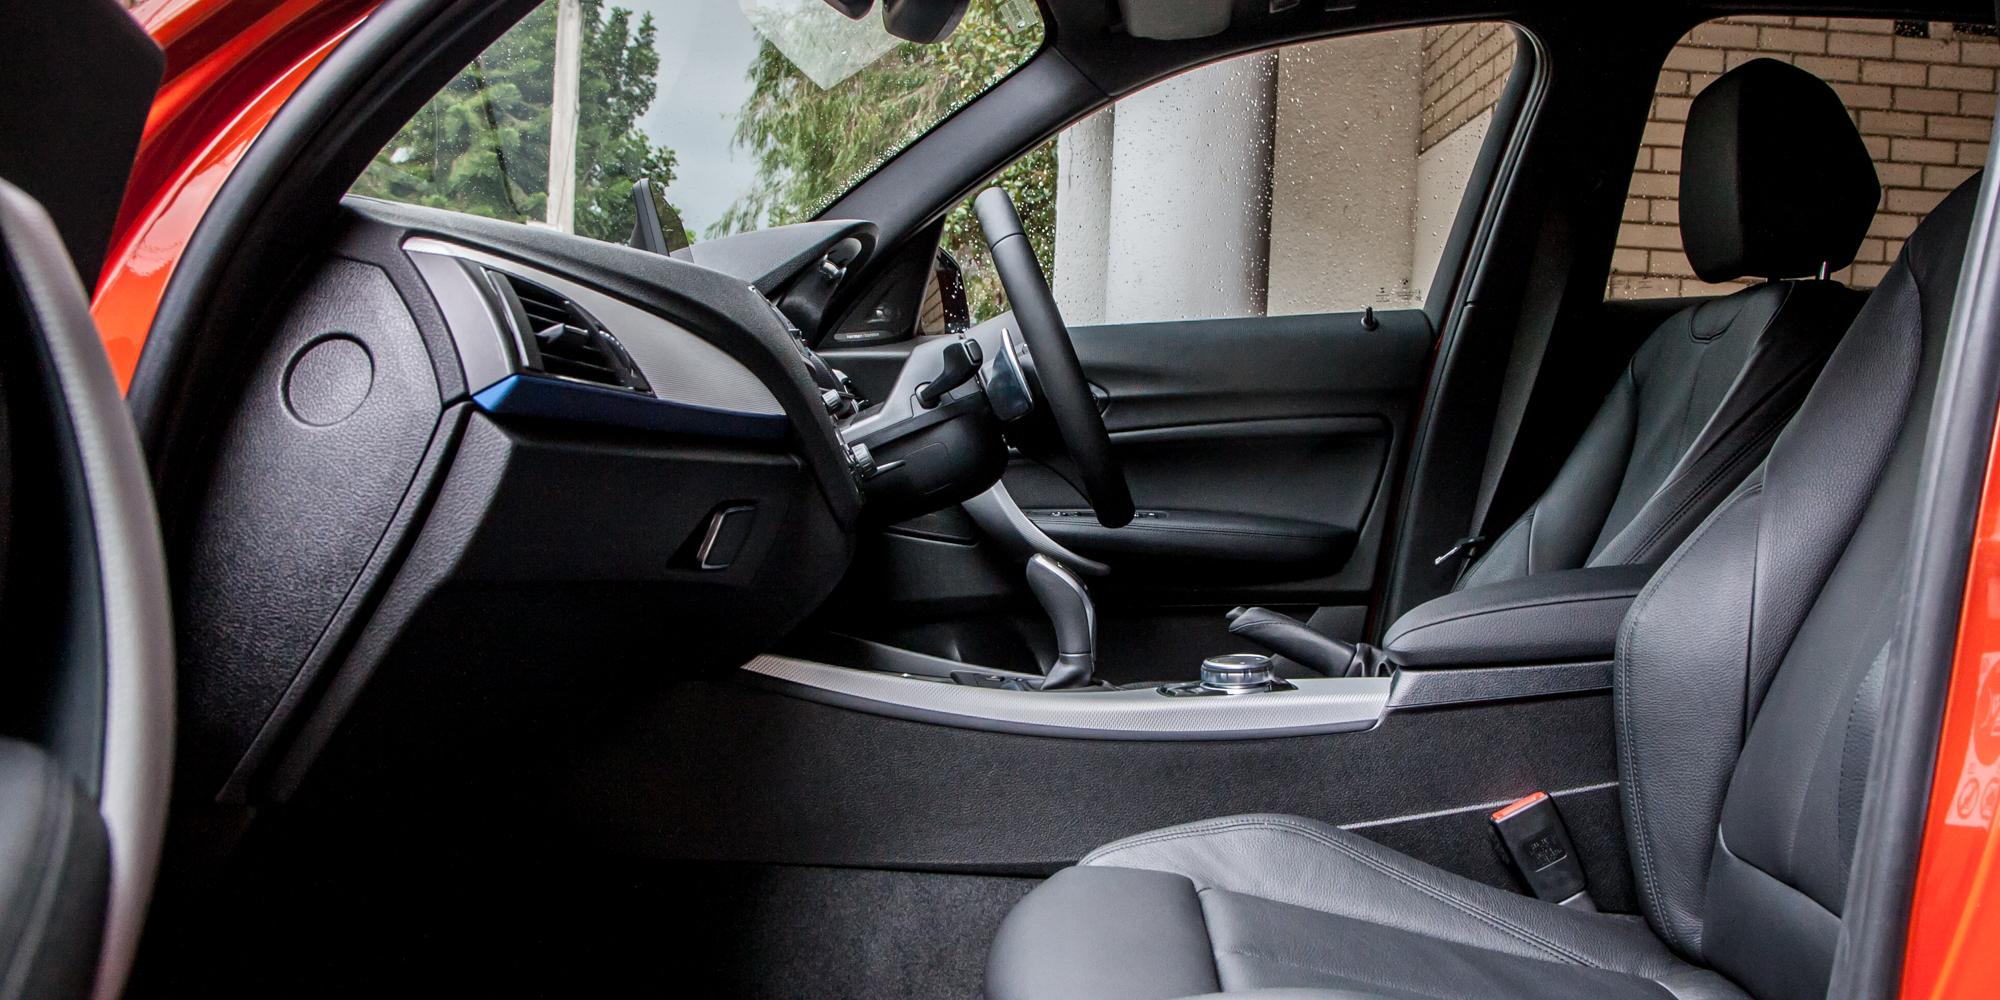 2015 BMW 125i Front Seats Interior